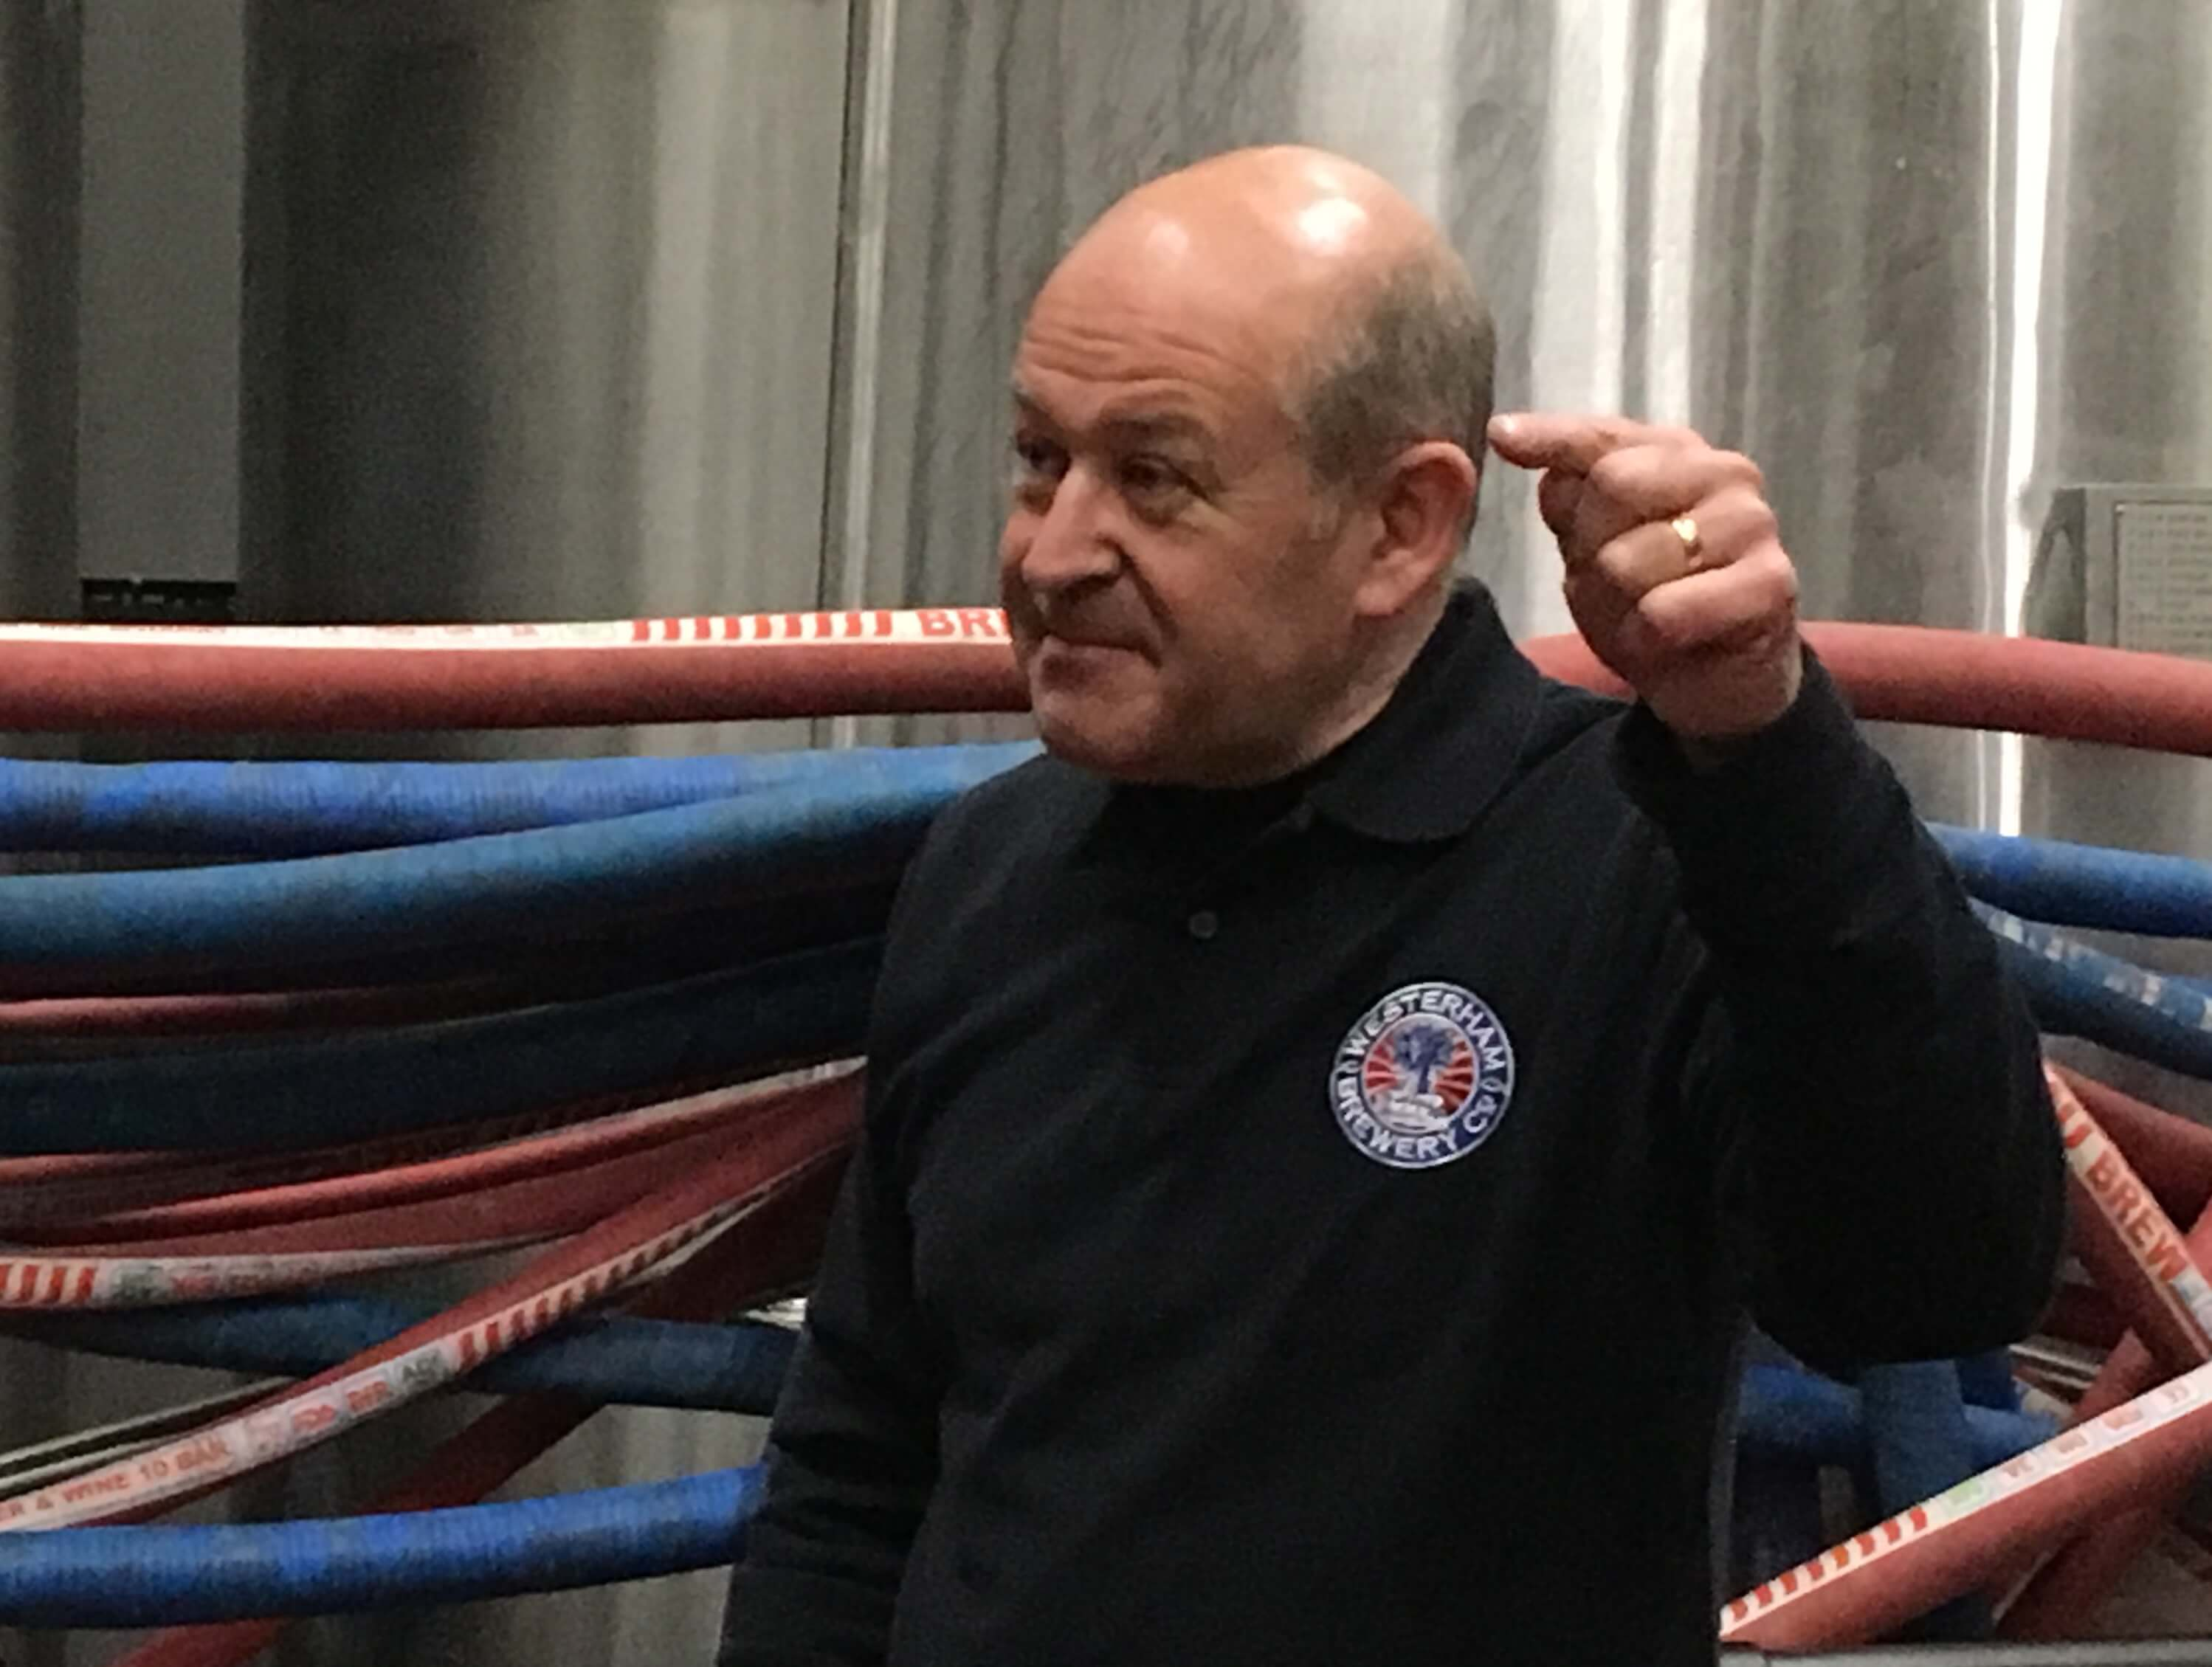 Robert Wicks - Westerham Brewery